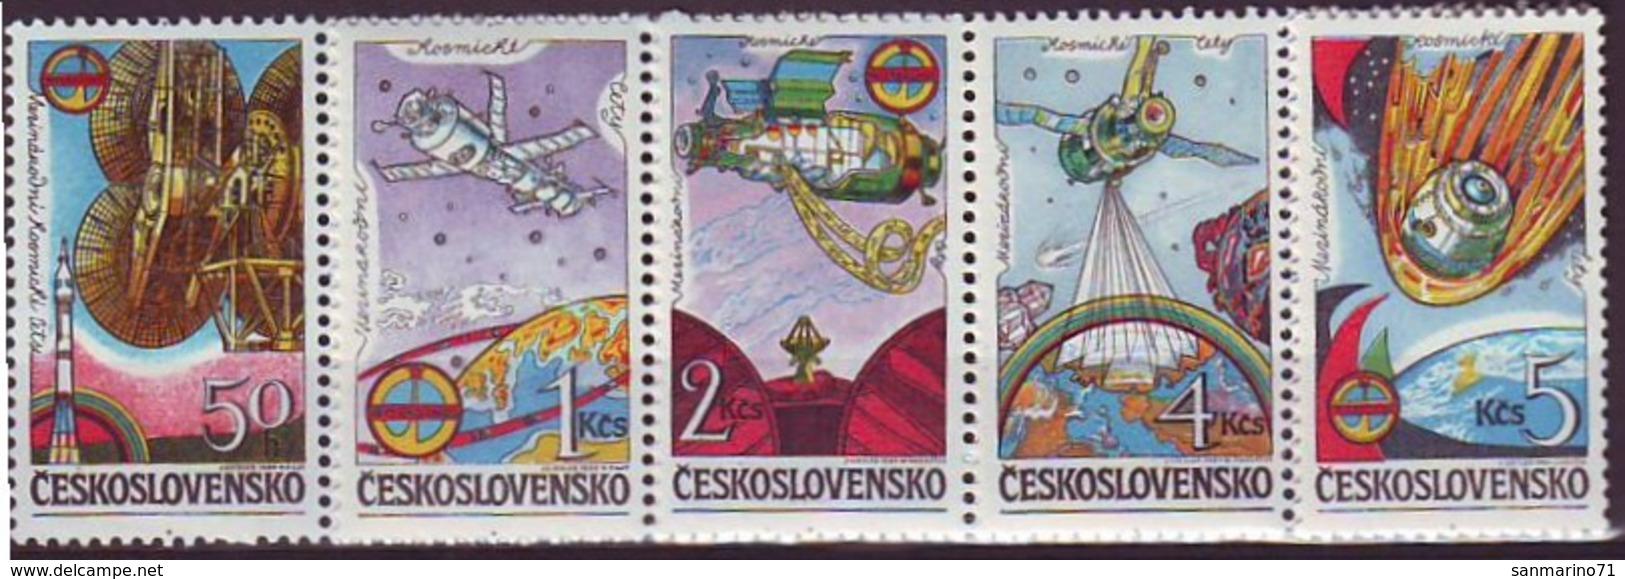 CZECHOSLOVAKIA 2758-2762,unused,space - Space